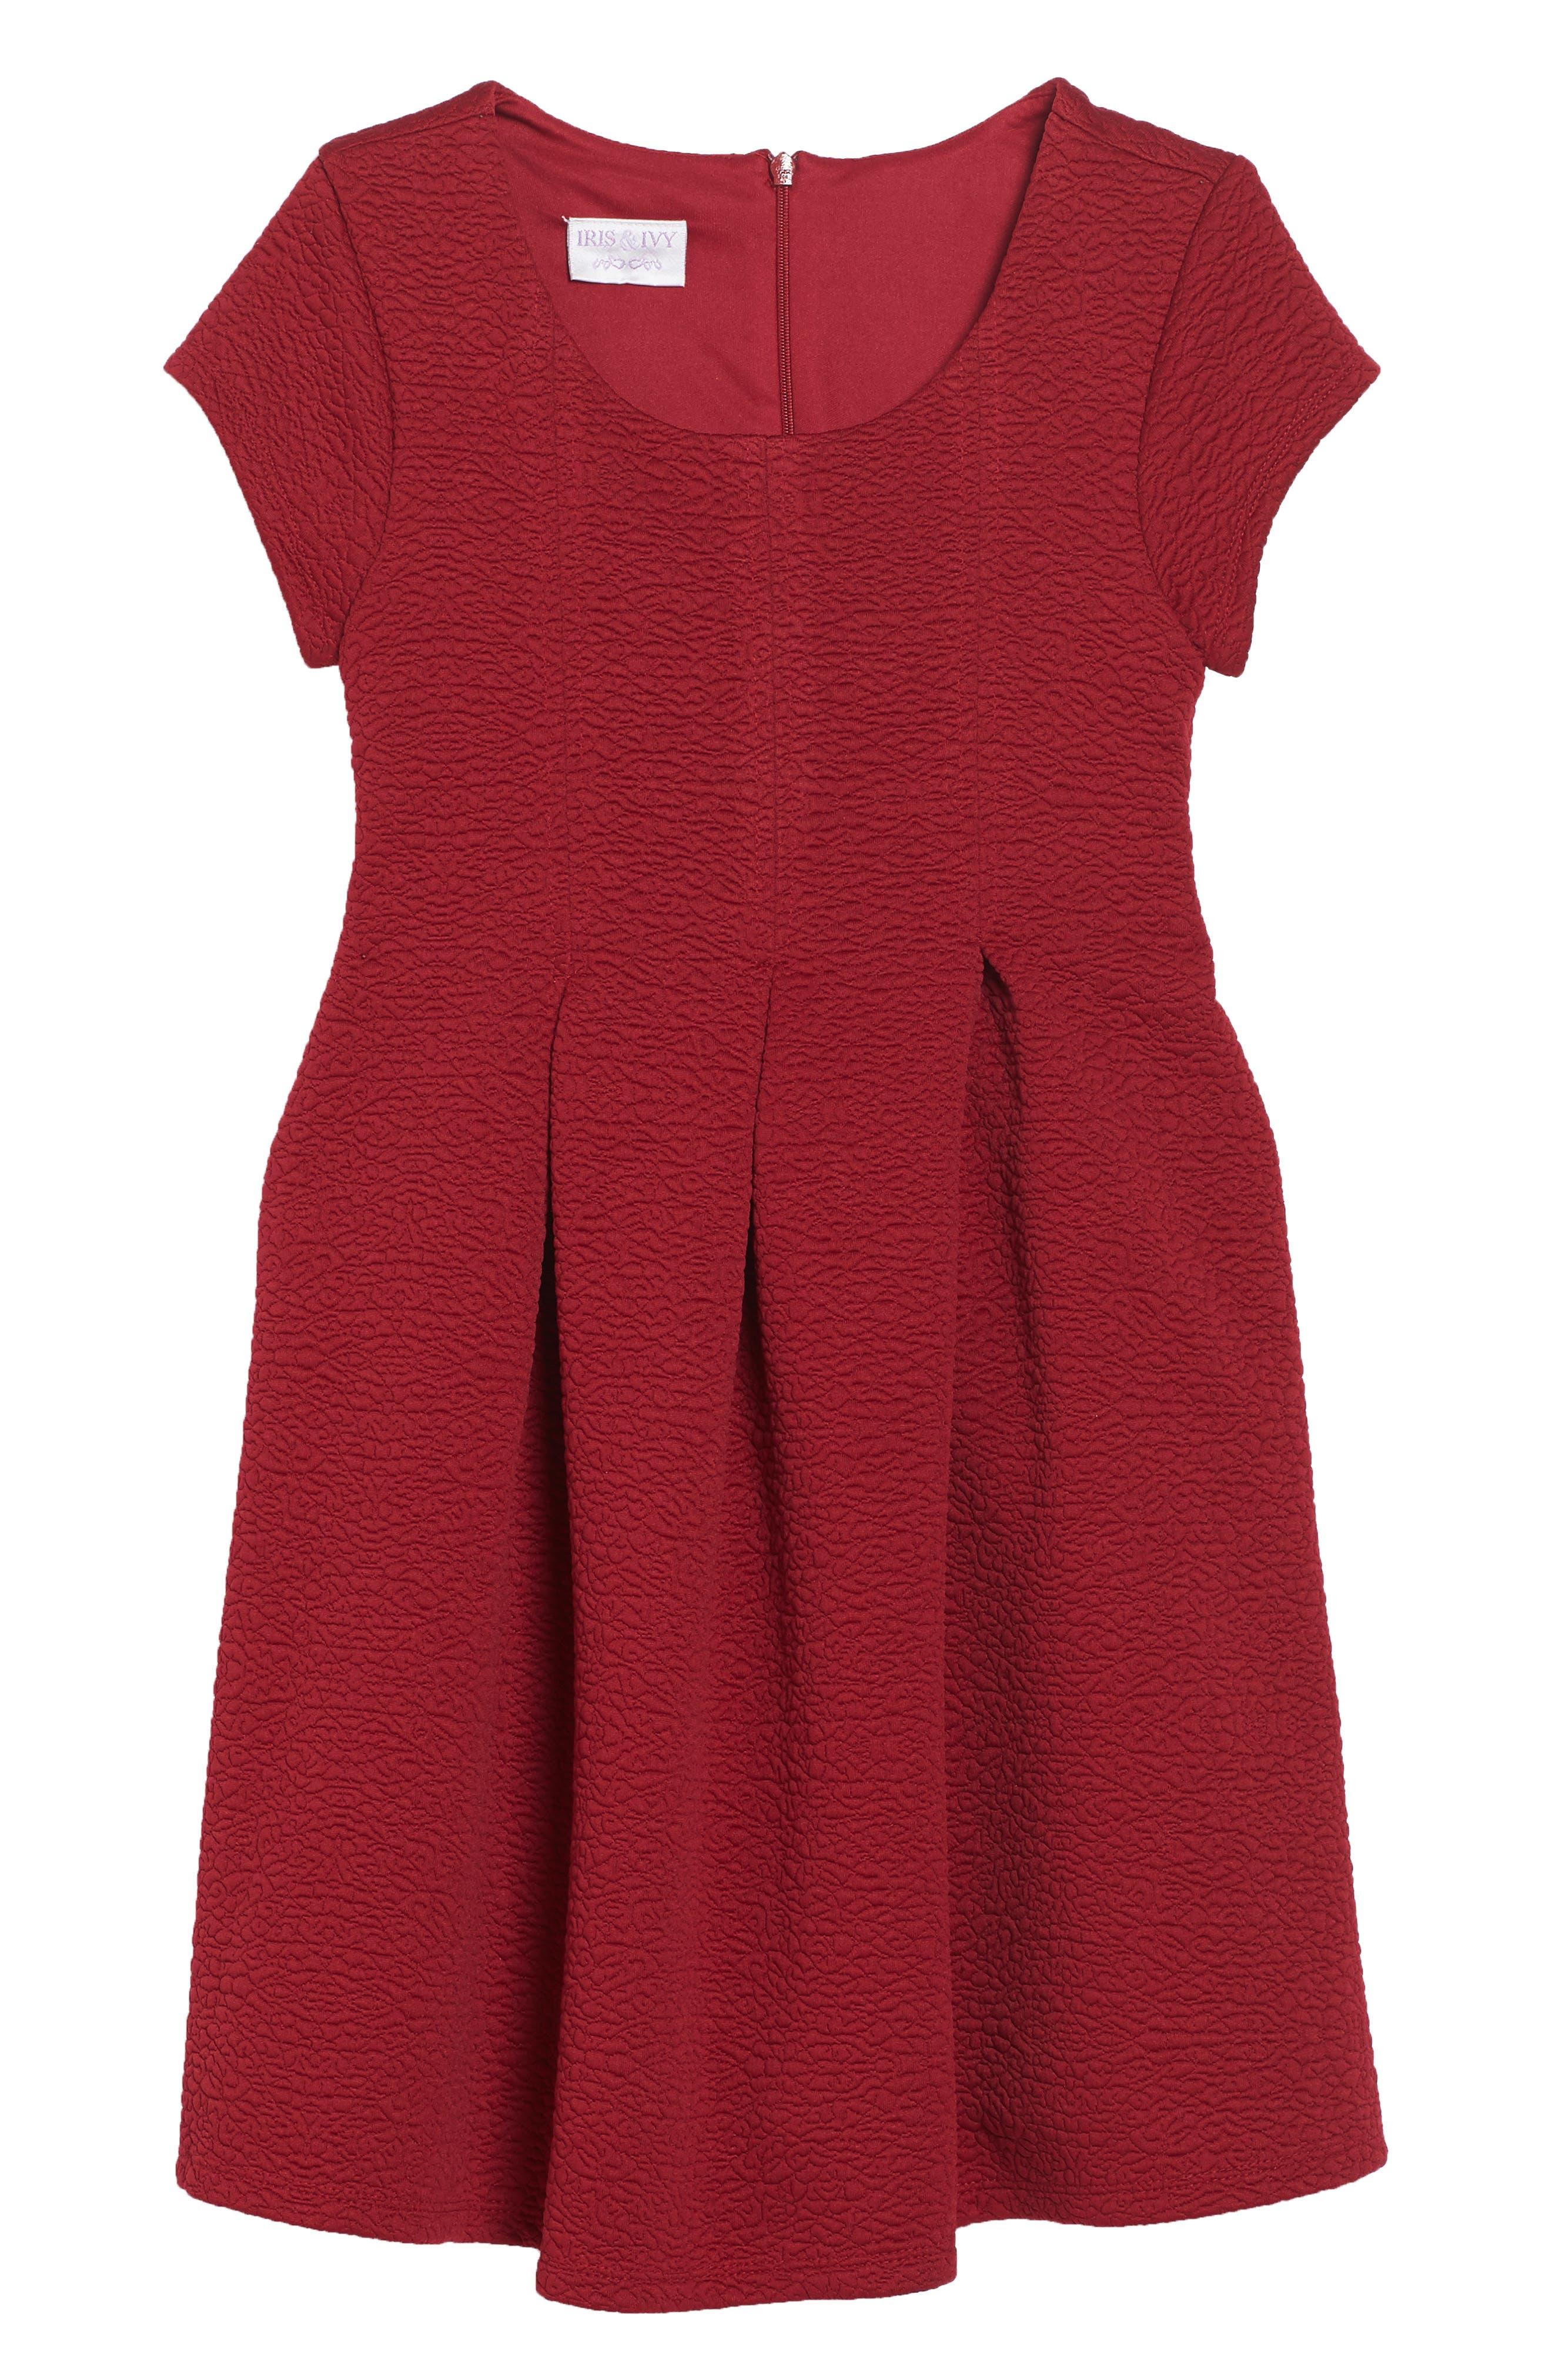 Main Image - Iris & Ivy Textured Knit Dress (Toddler Girls, Little Girls & Big Girls)